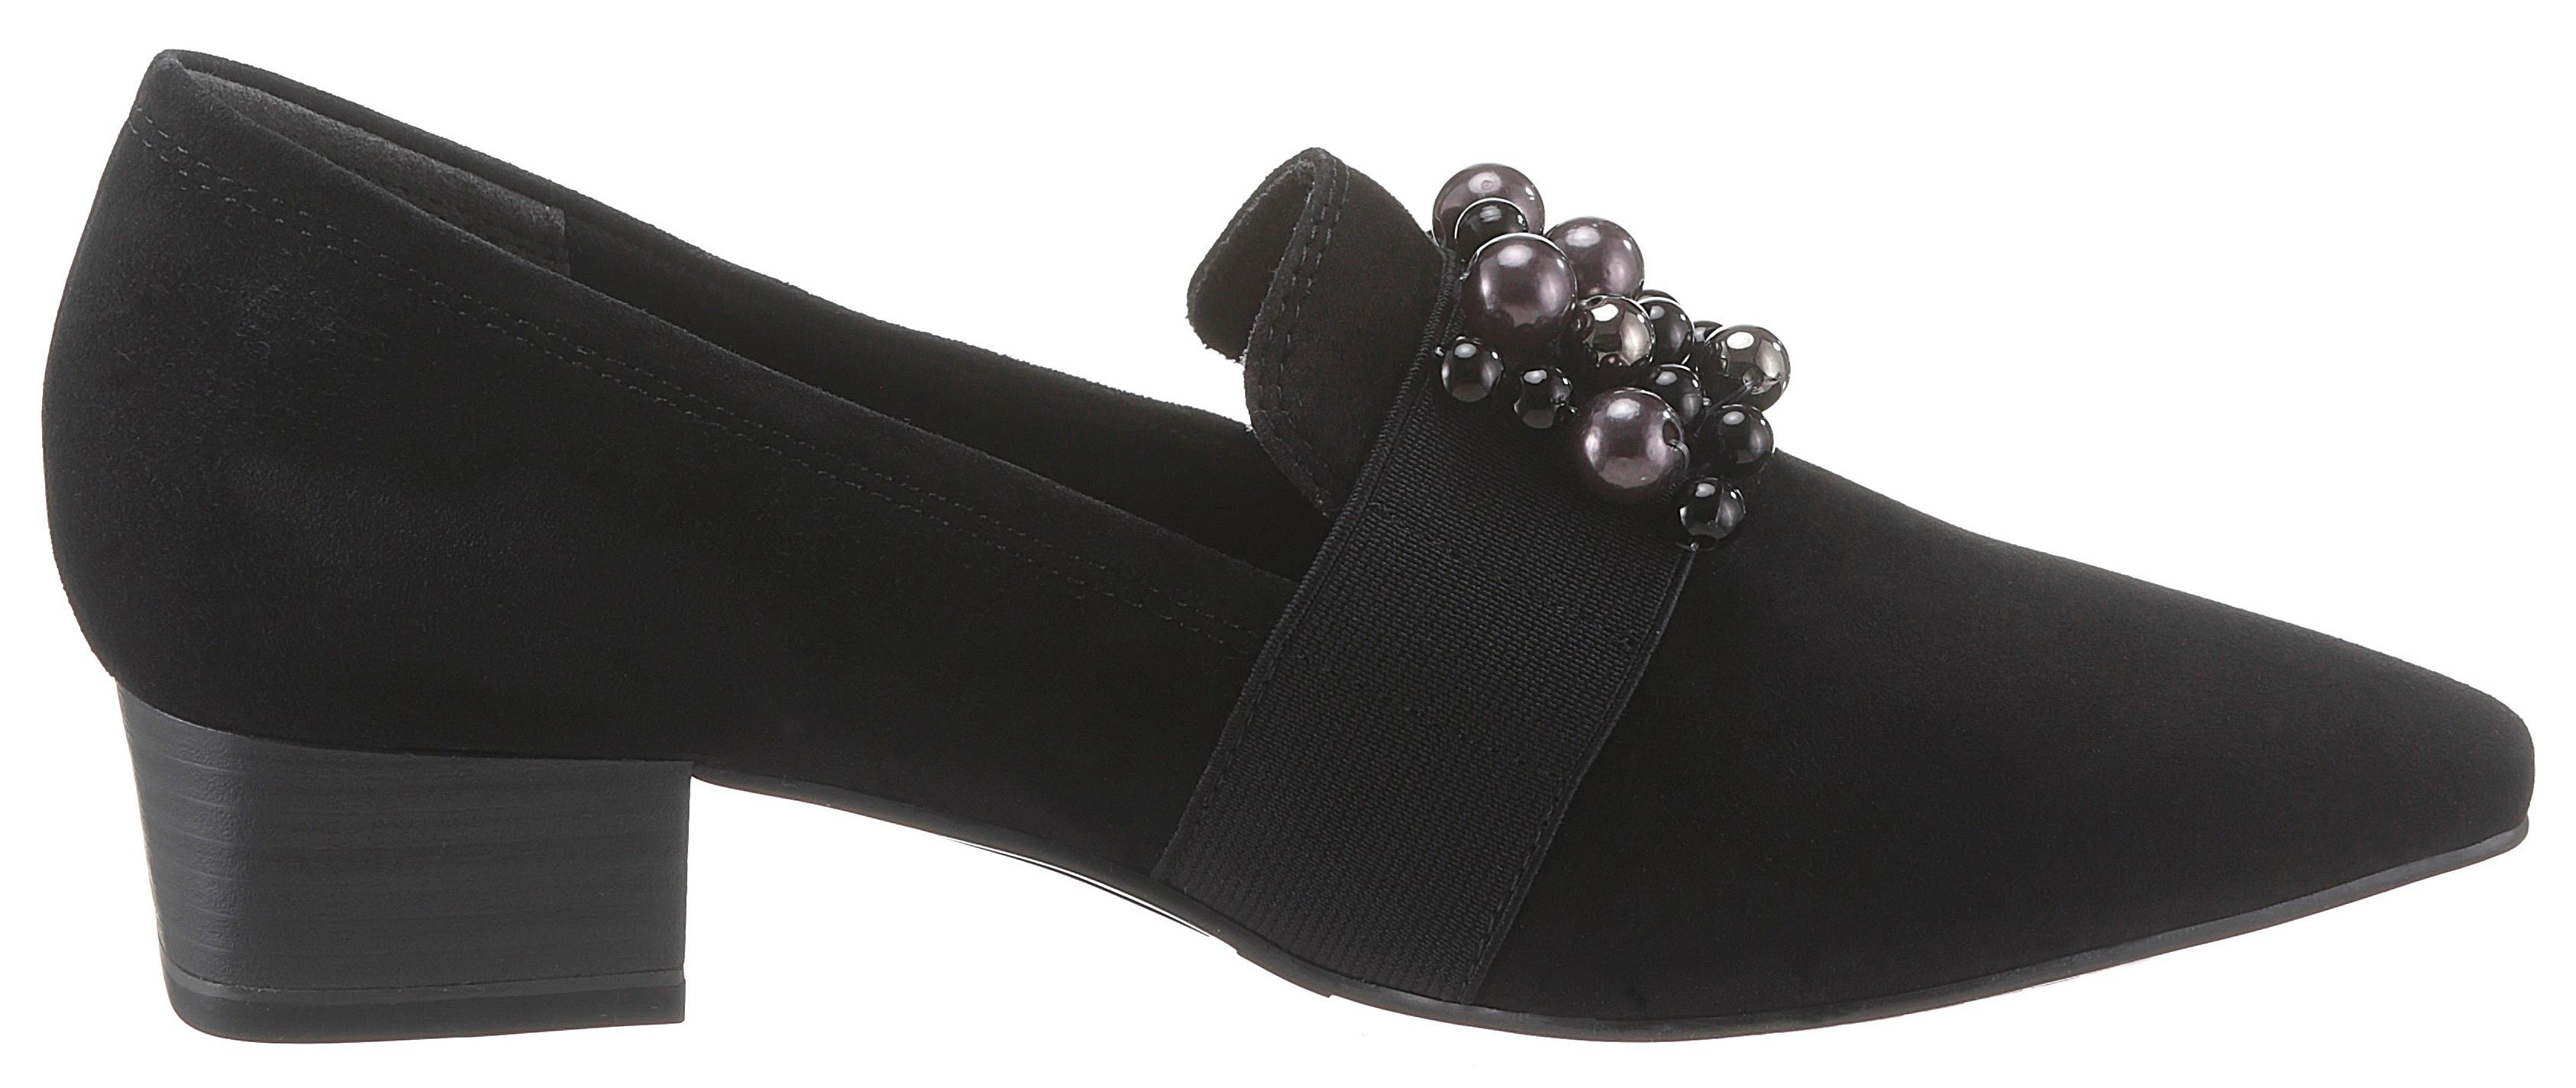 Hochfrontpumps Tamaris Tamaris Tamaris Damenmode Damen Schuhe Pumps Leder 63db1f